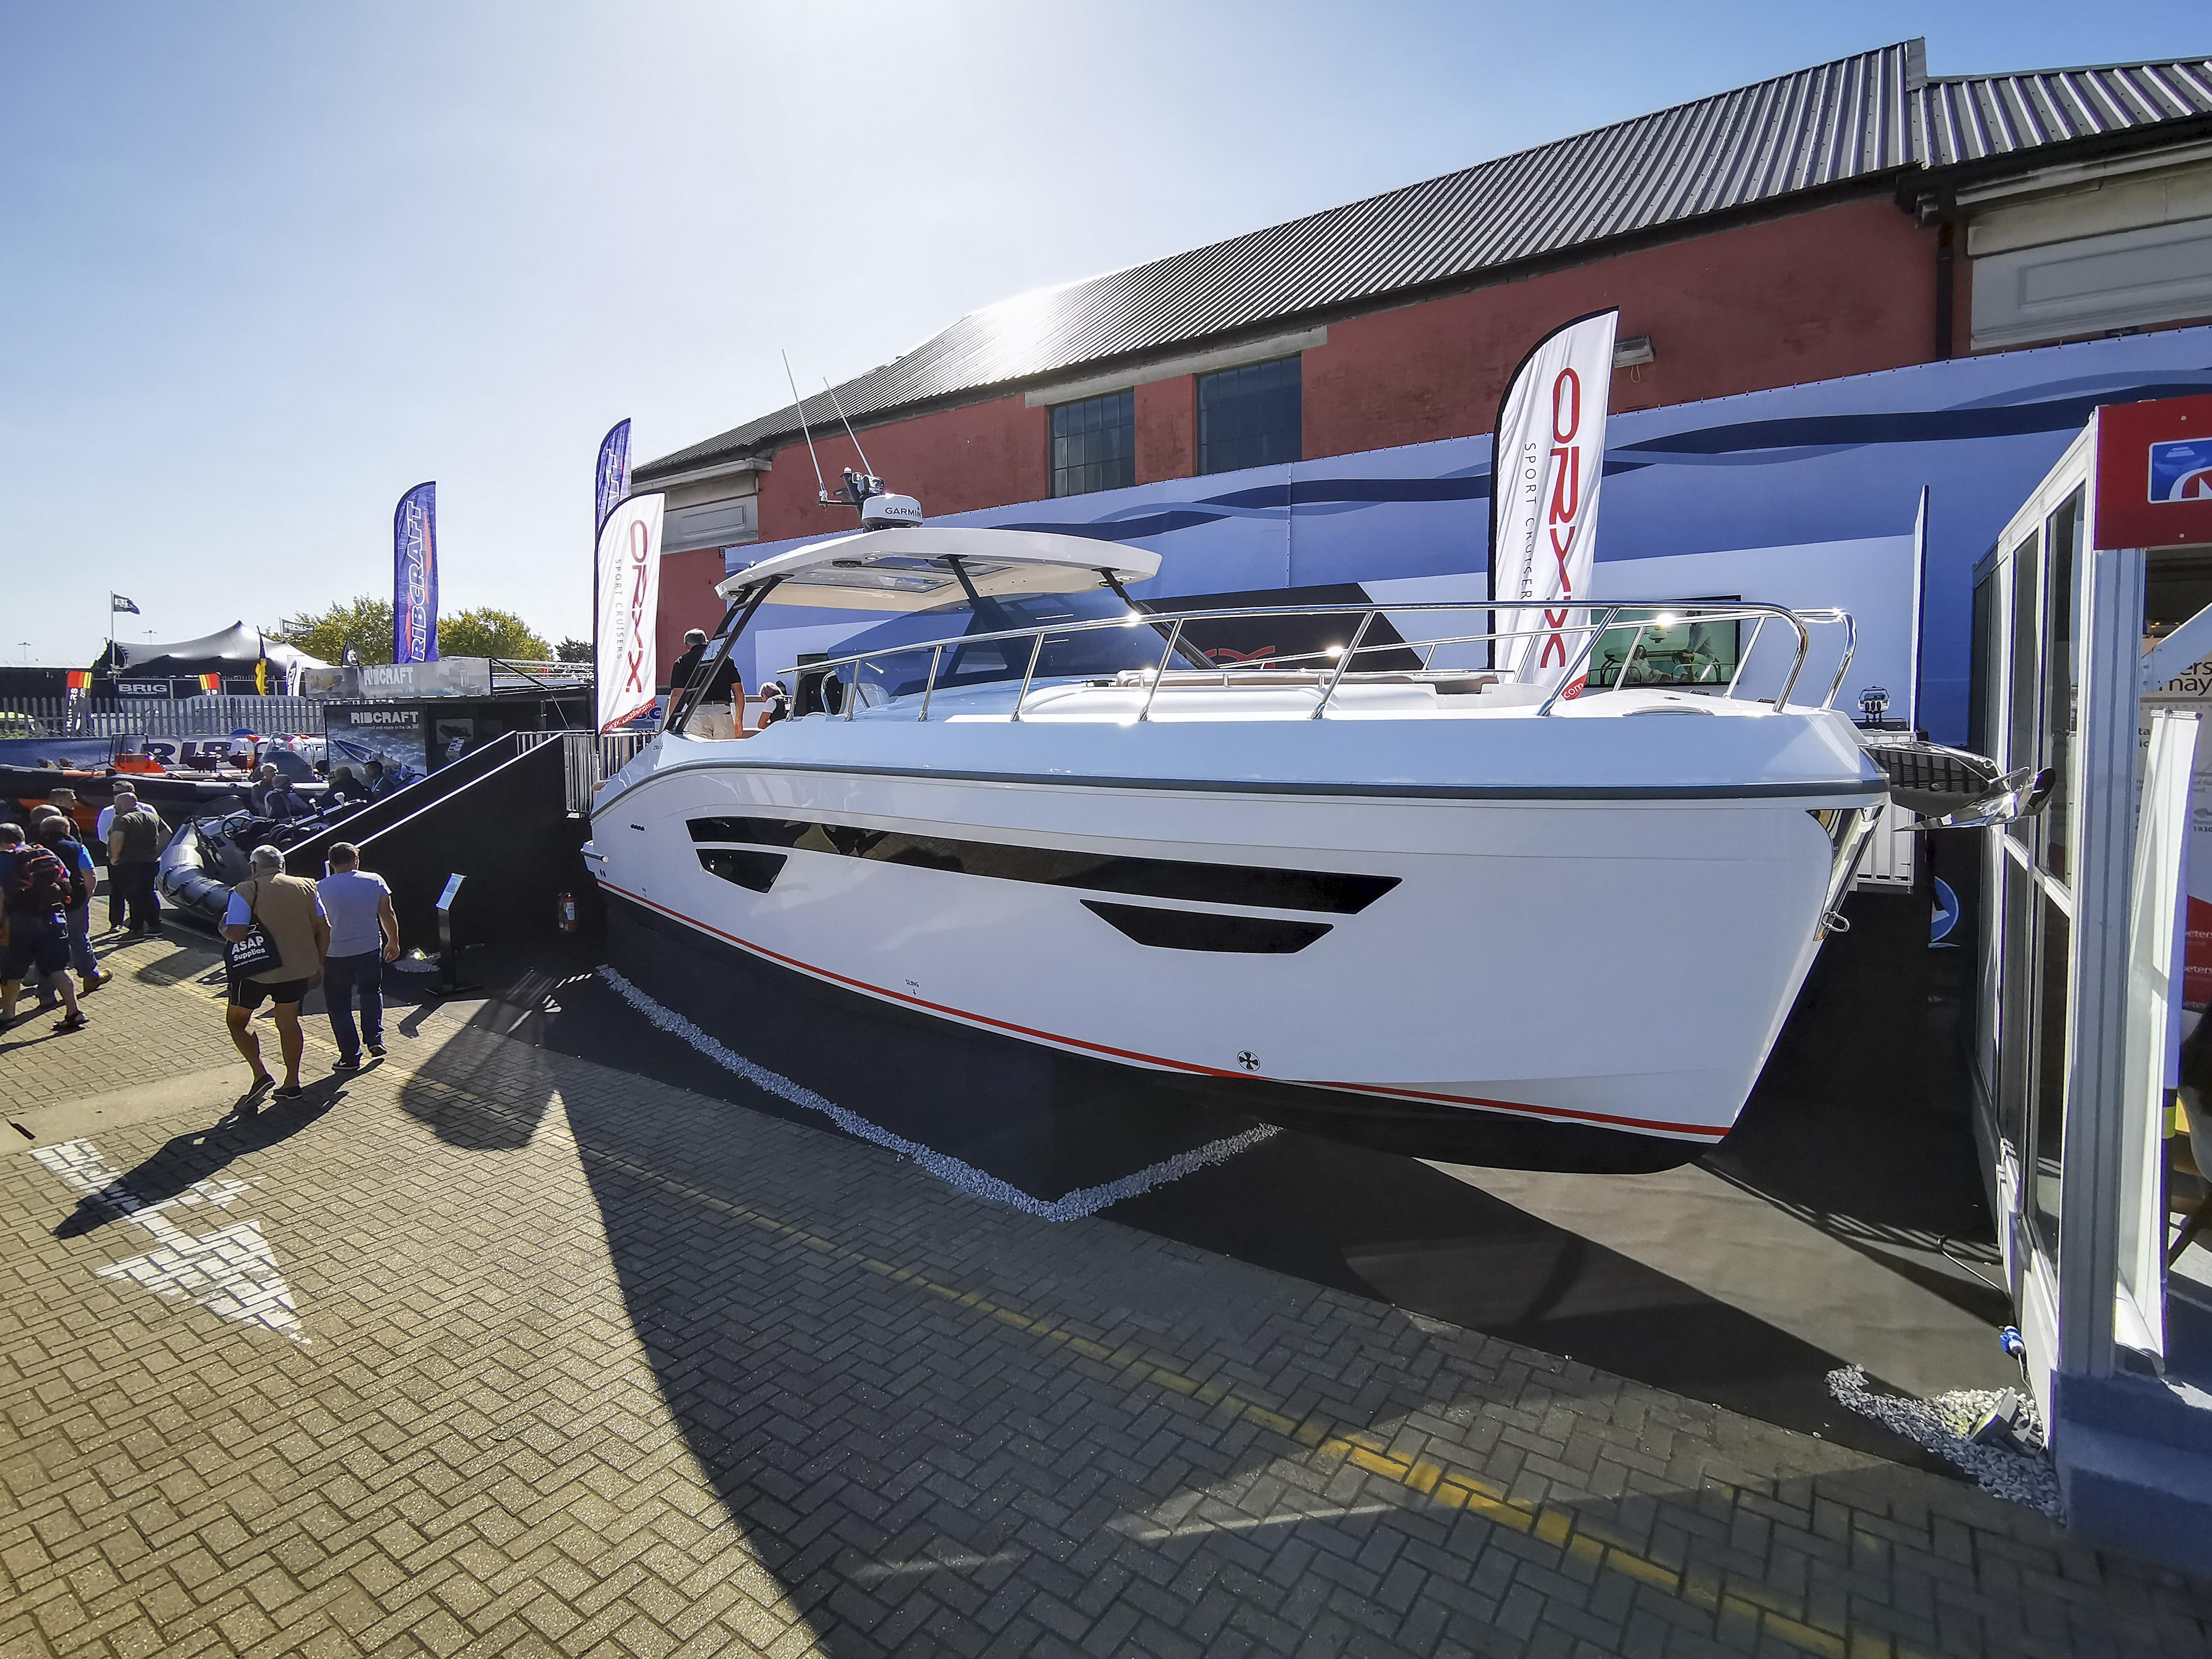 Oryx at Southampton Boat Show 2019 (9)